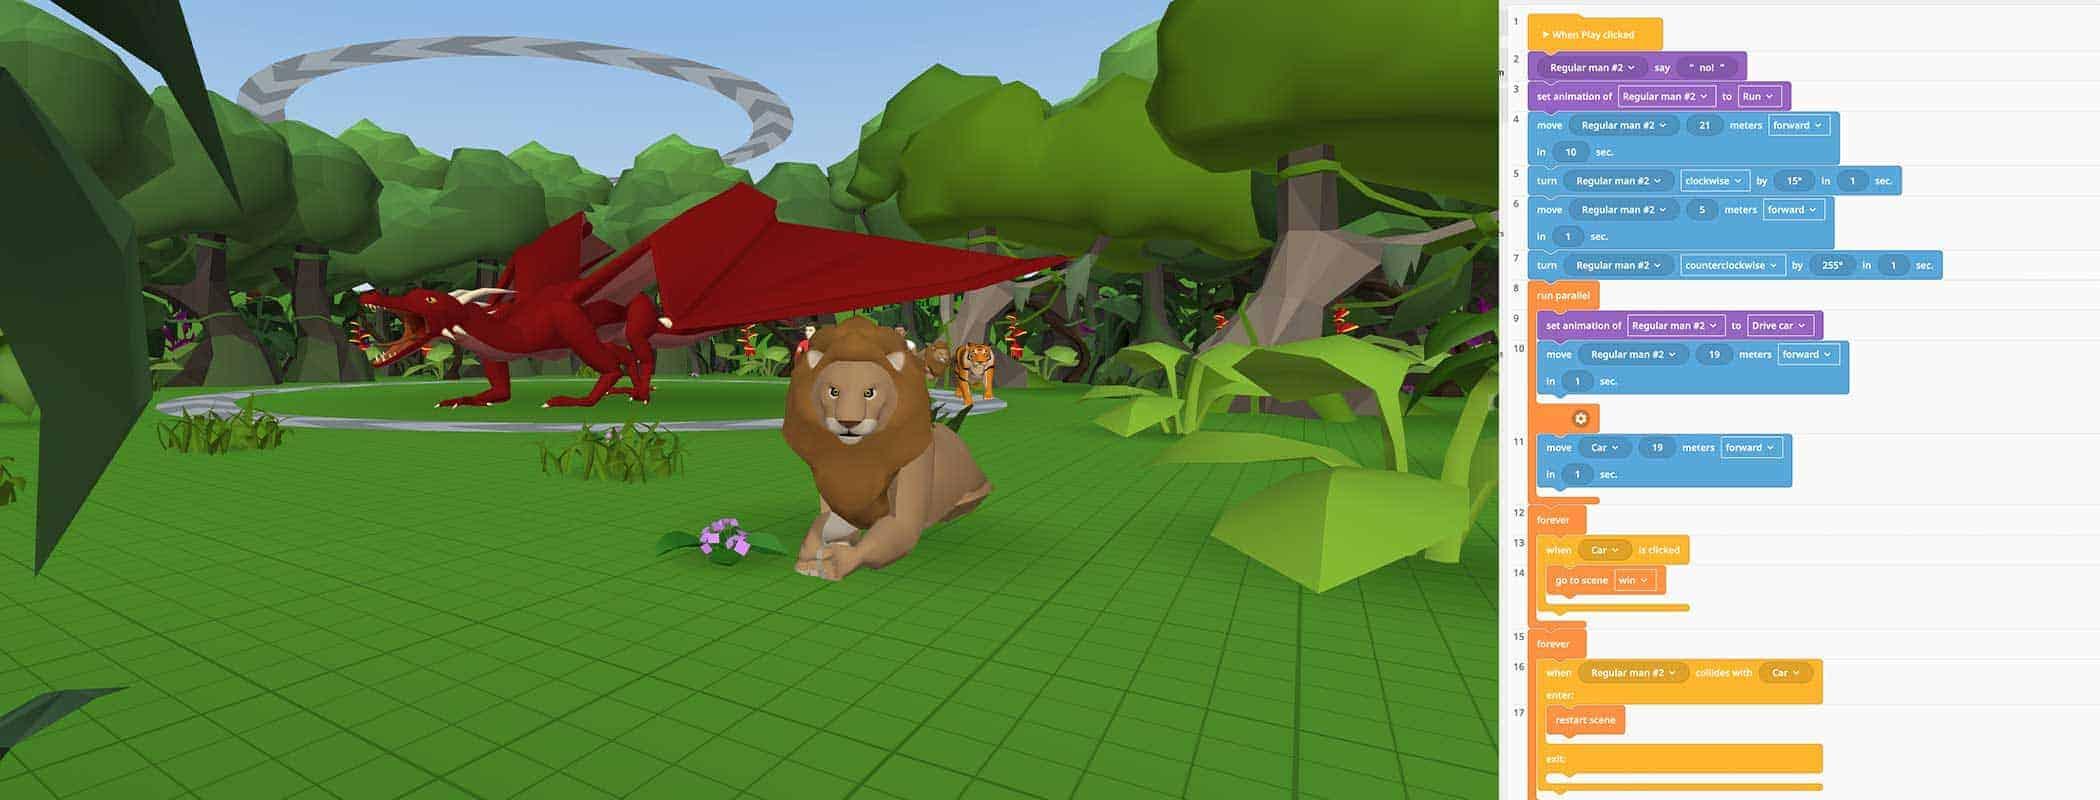 Virtual Reality: Coding & Design